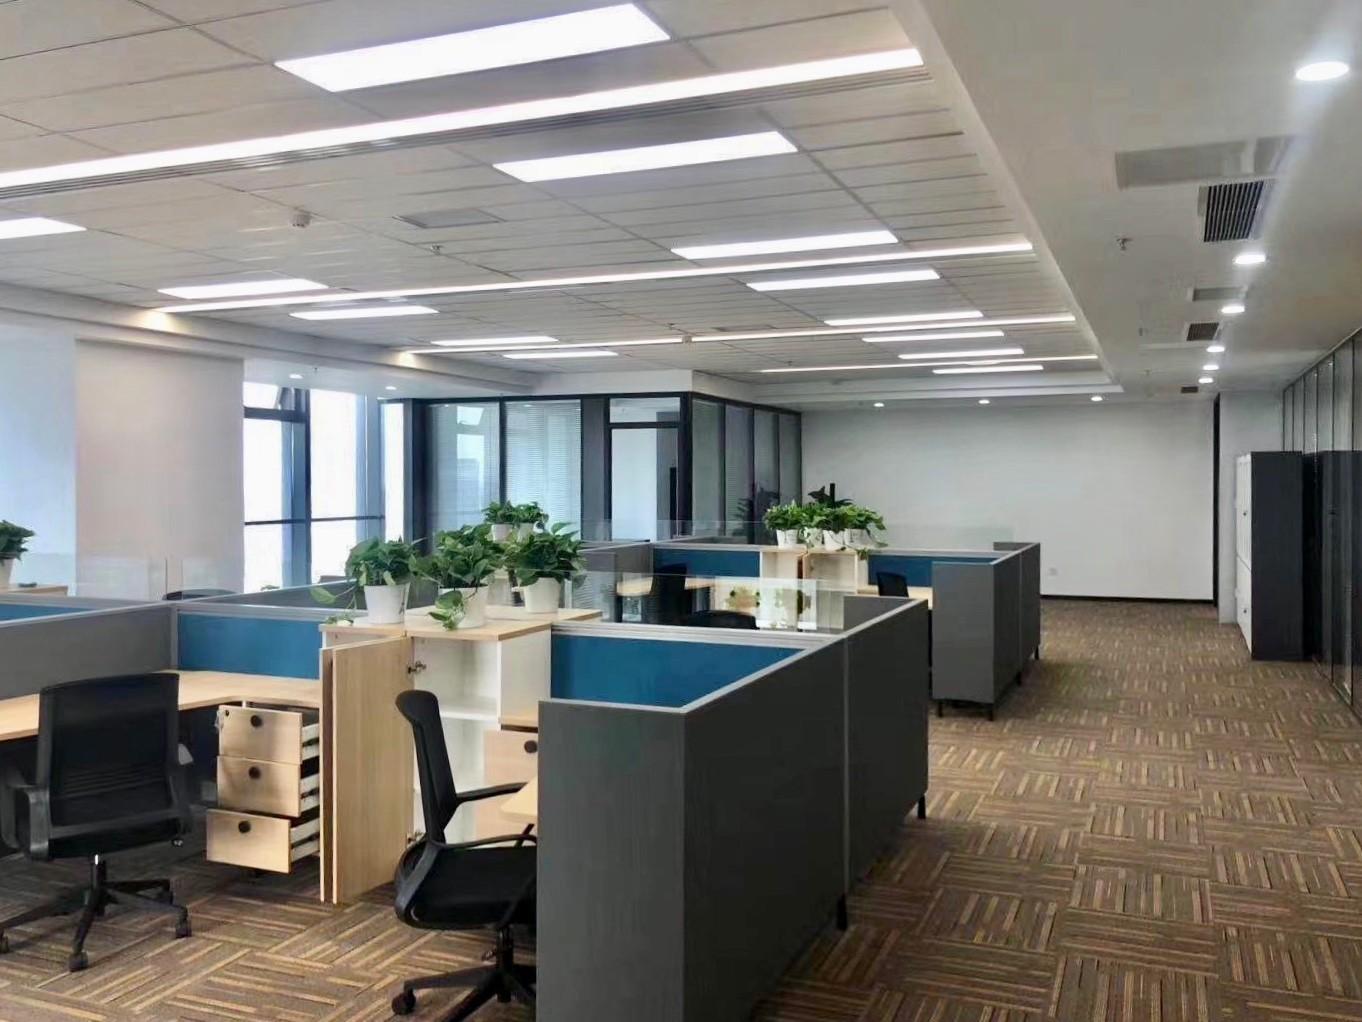 application-Office Furniture Project in Beijing Zhongguancun Science City-GOJO-img